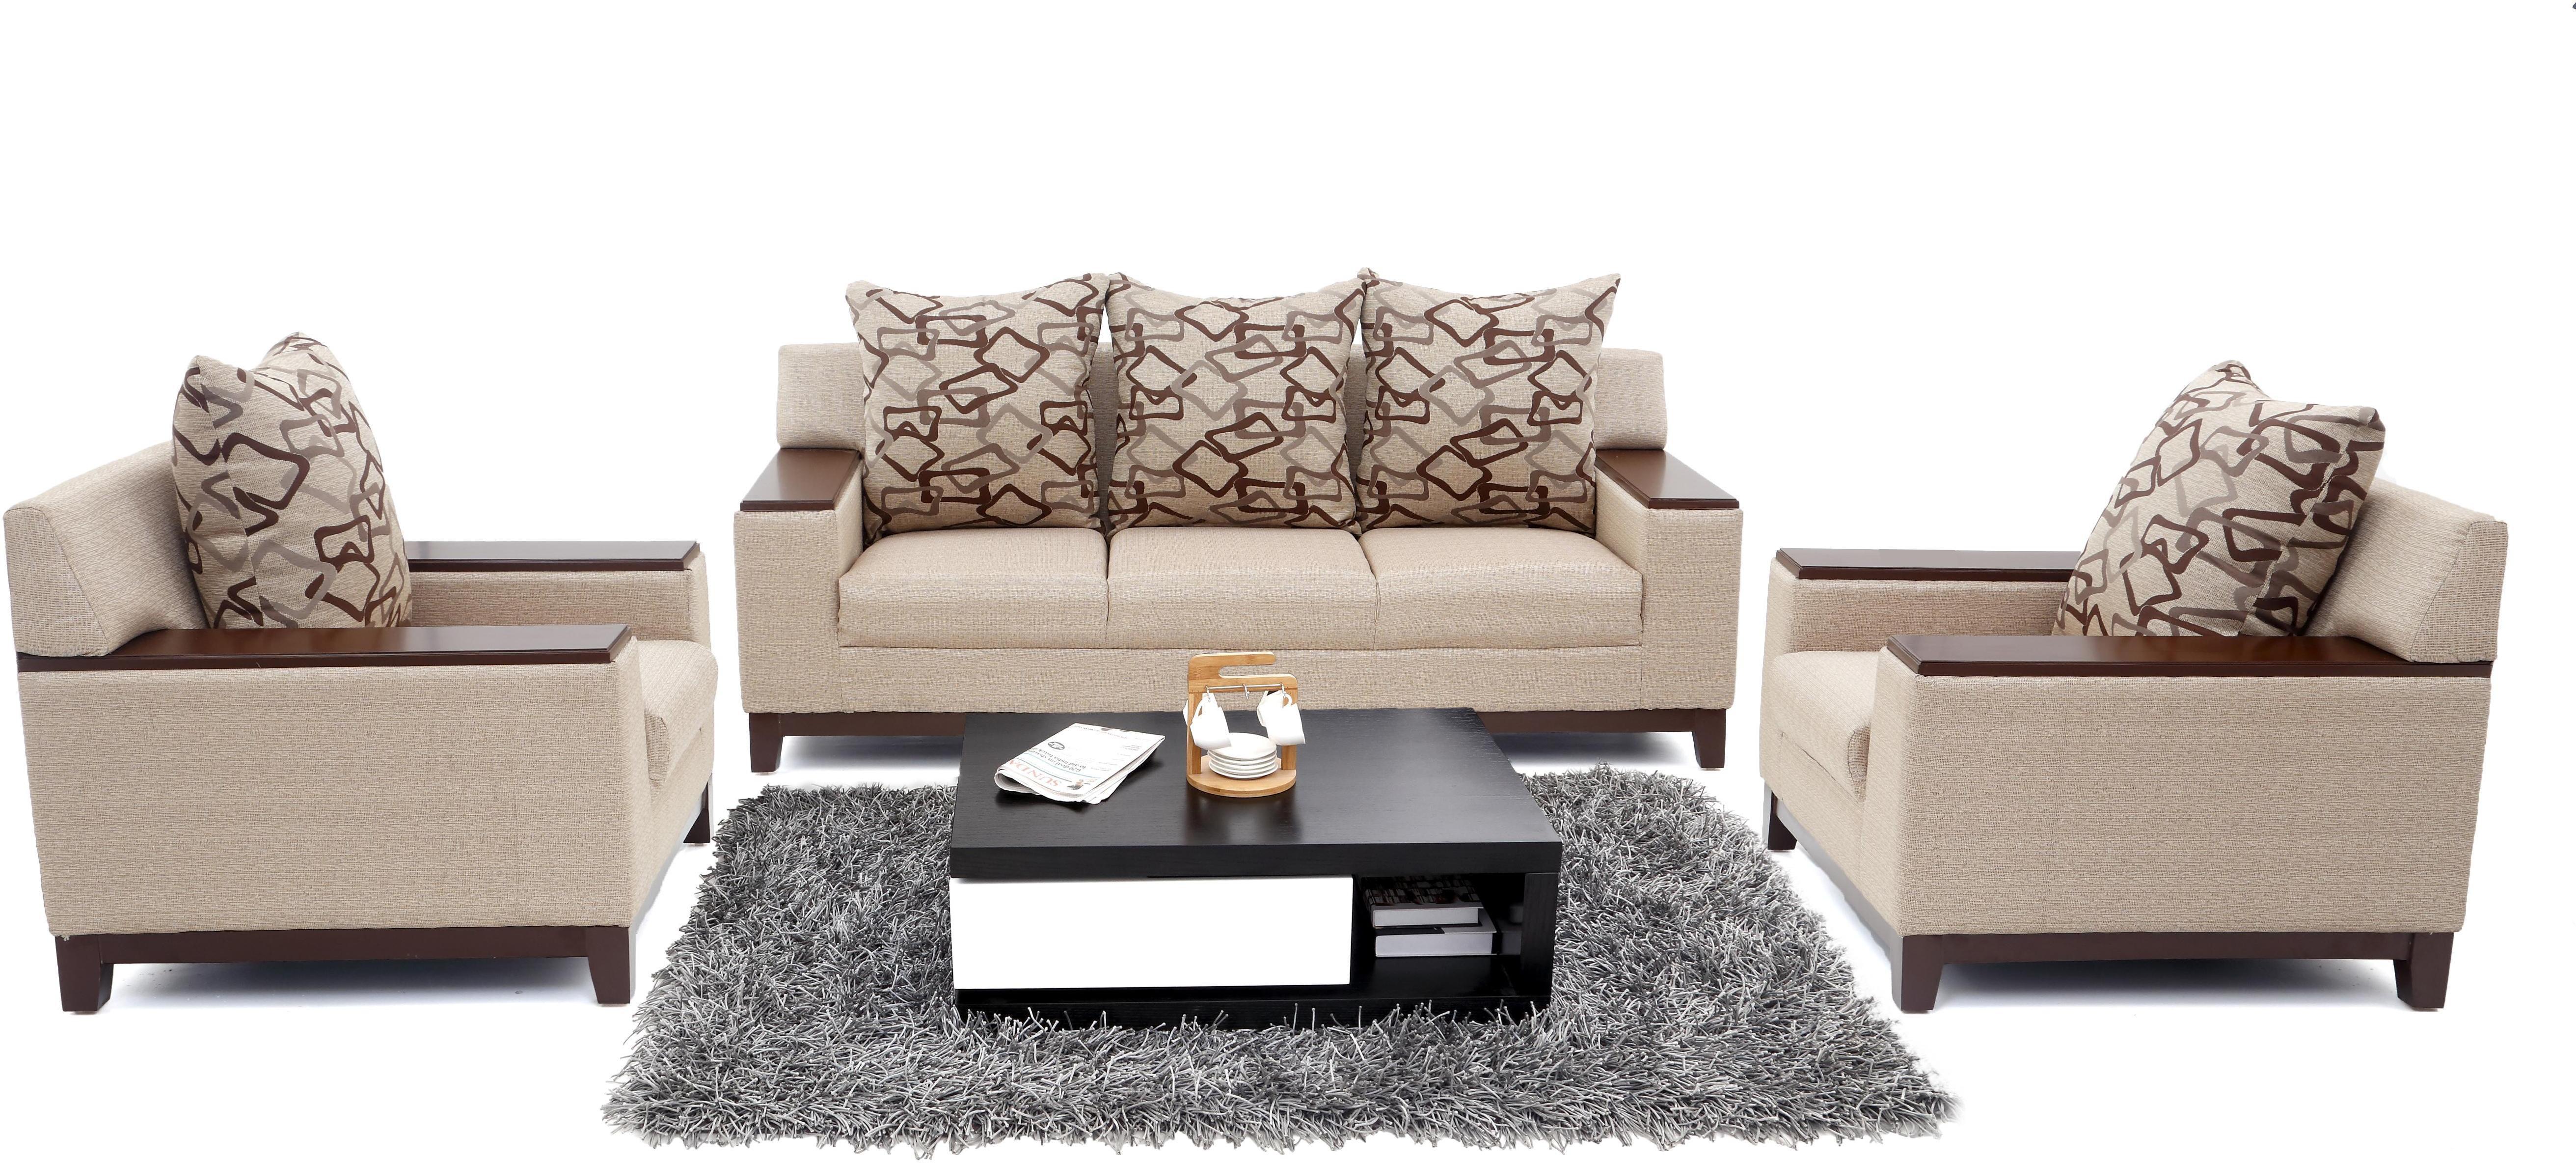 Furnicity Fabric 3 1 1 Beige Sofa Set Configuration